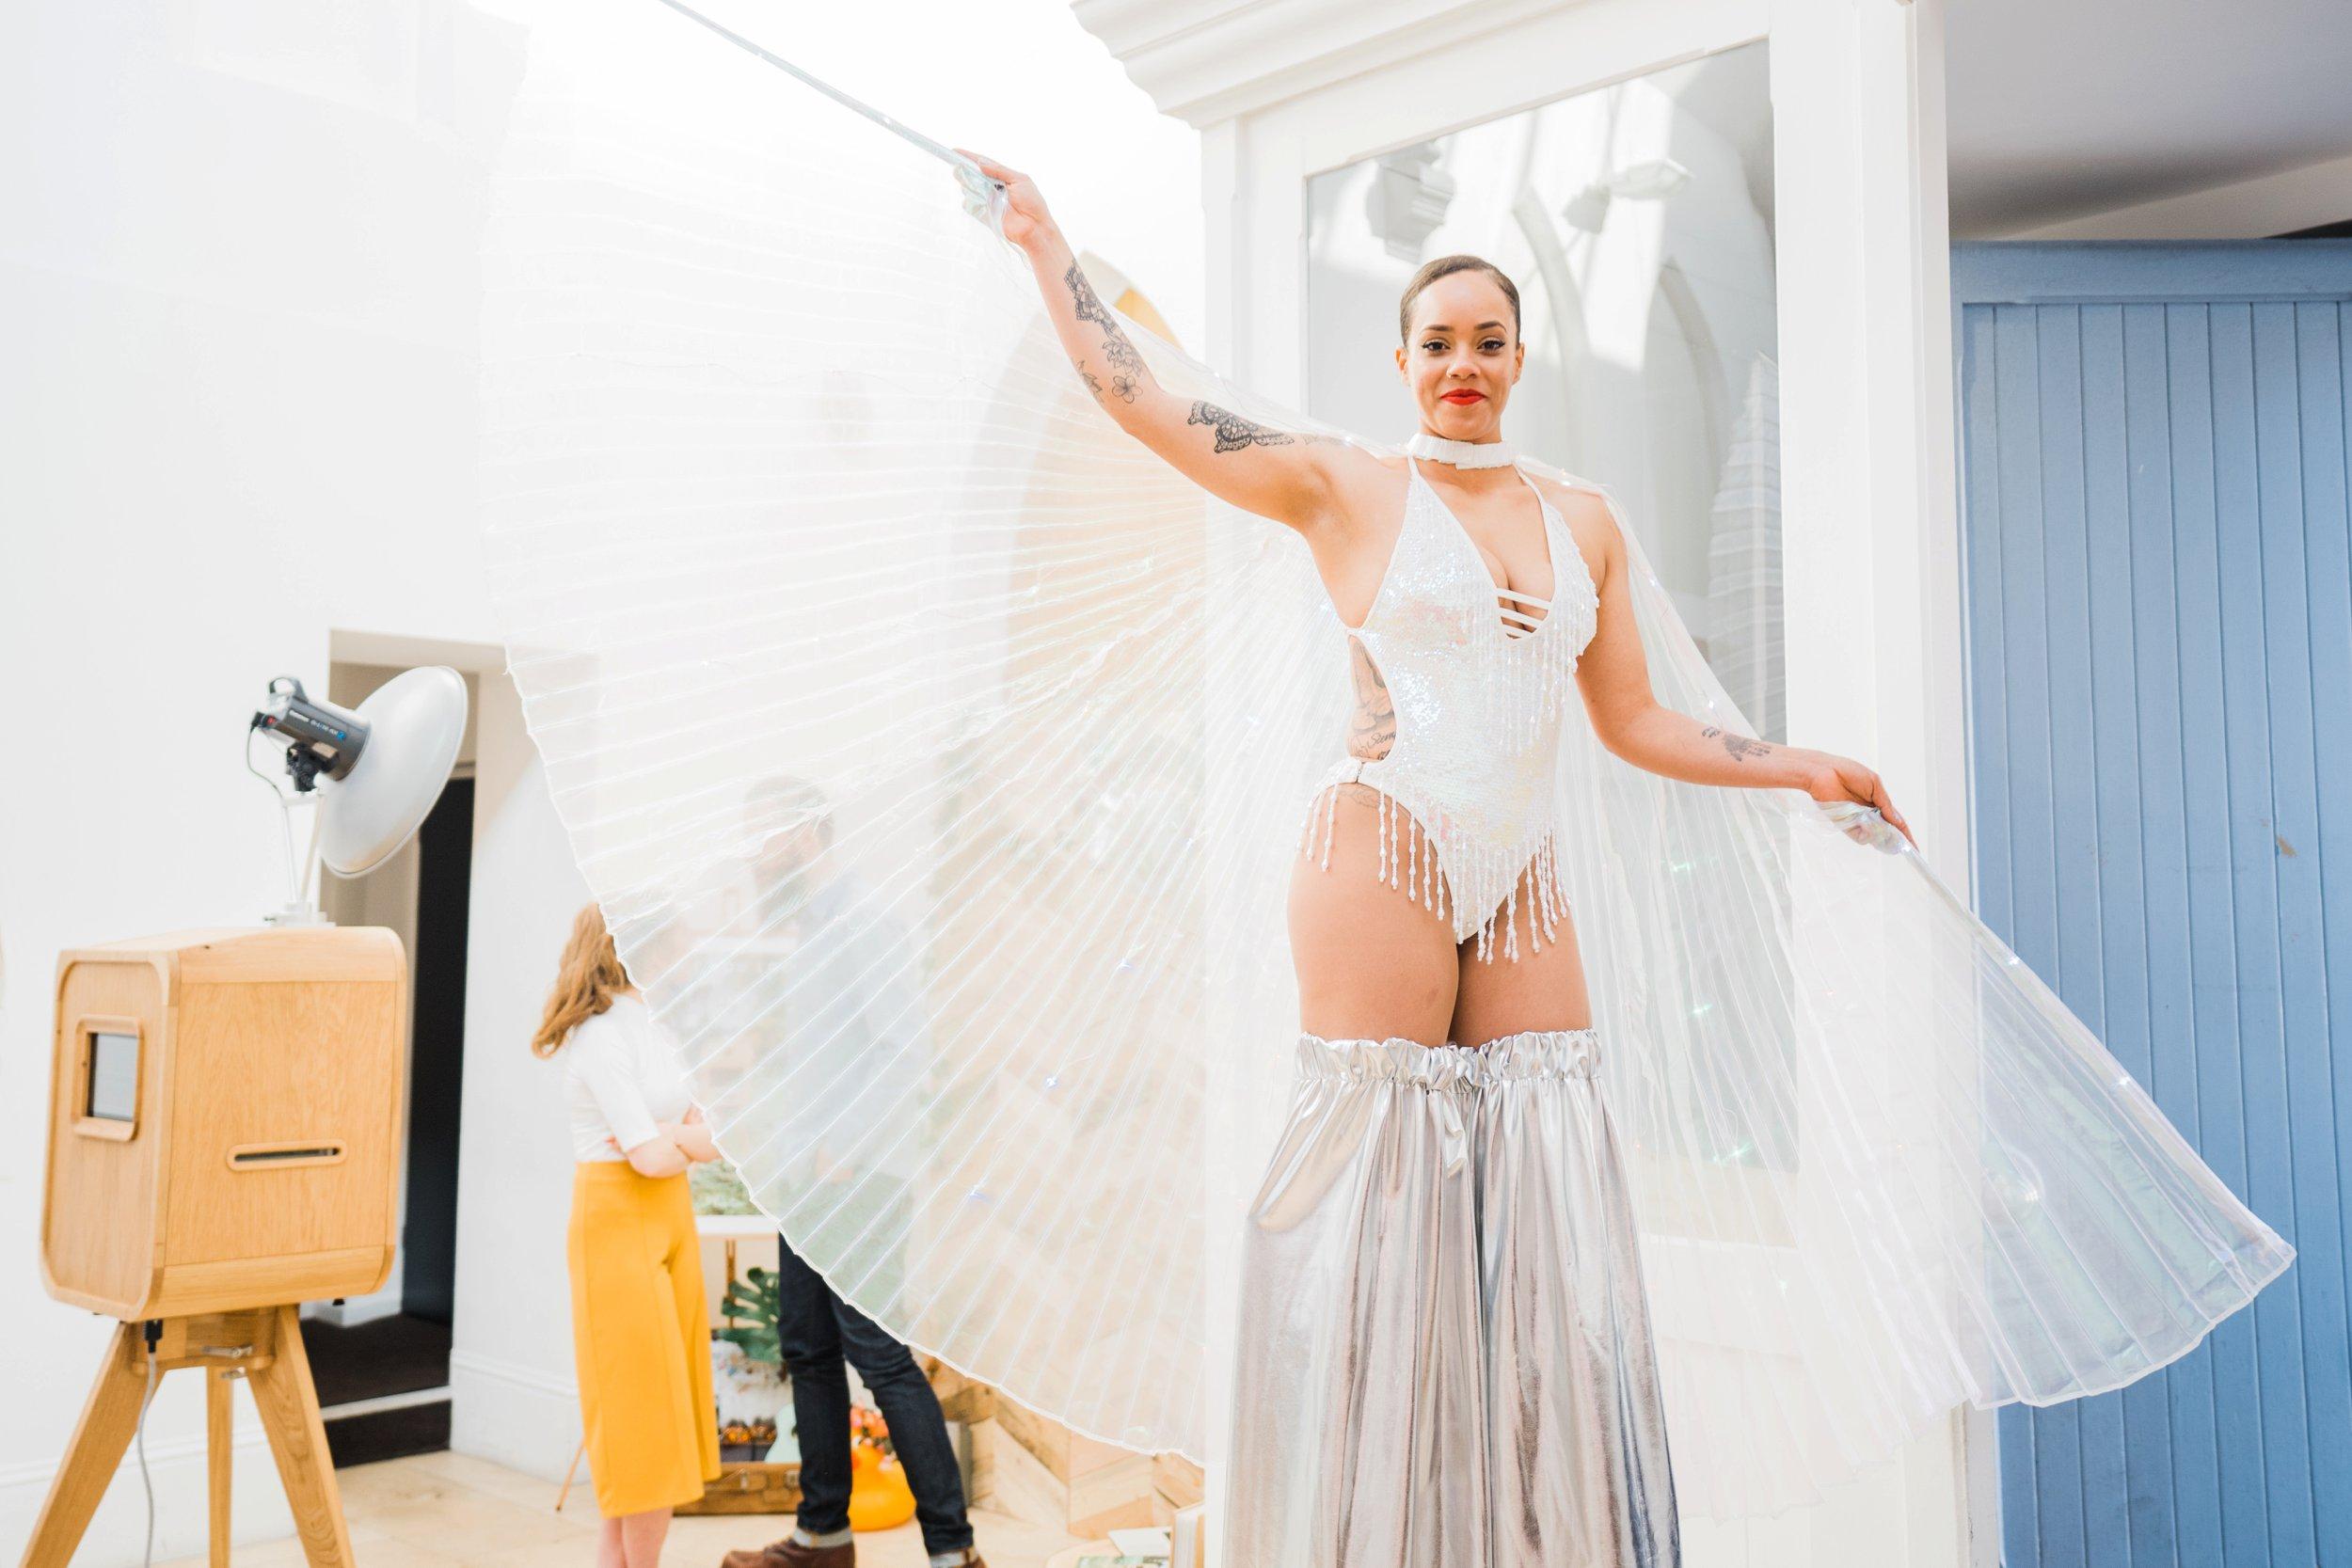 The UN-WEDDING SHOW 2019 cool bride style modern wedding fair Birmingham Fazeley Studios 00001.jpg